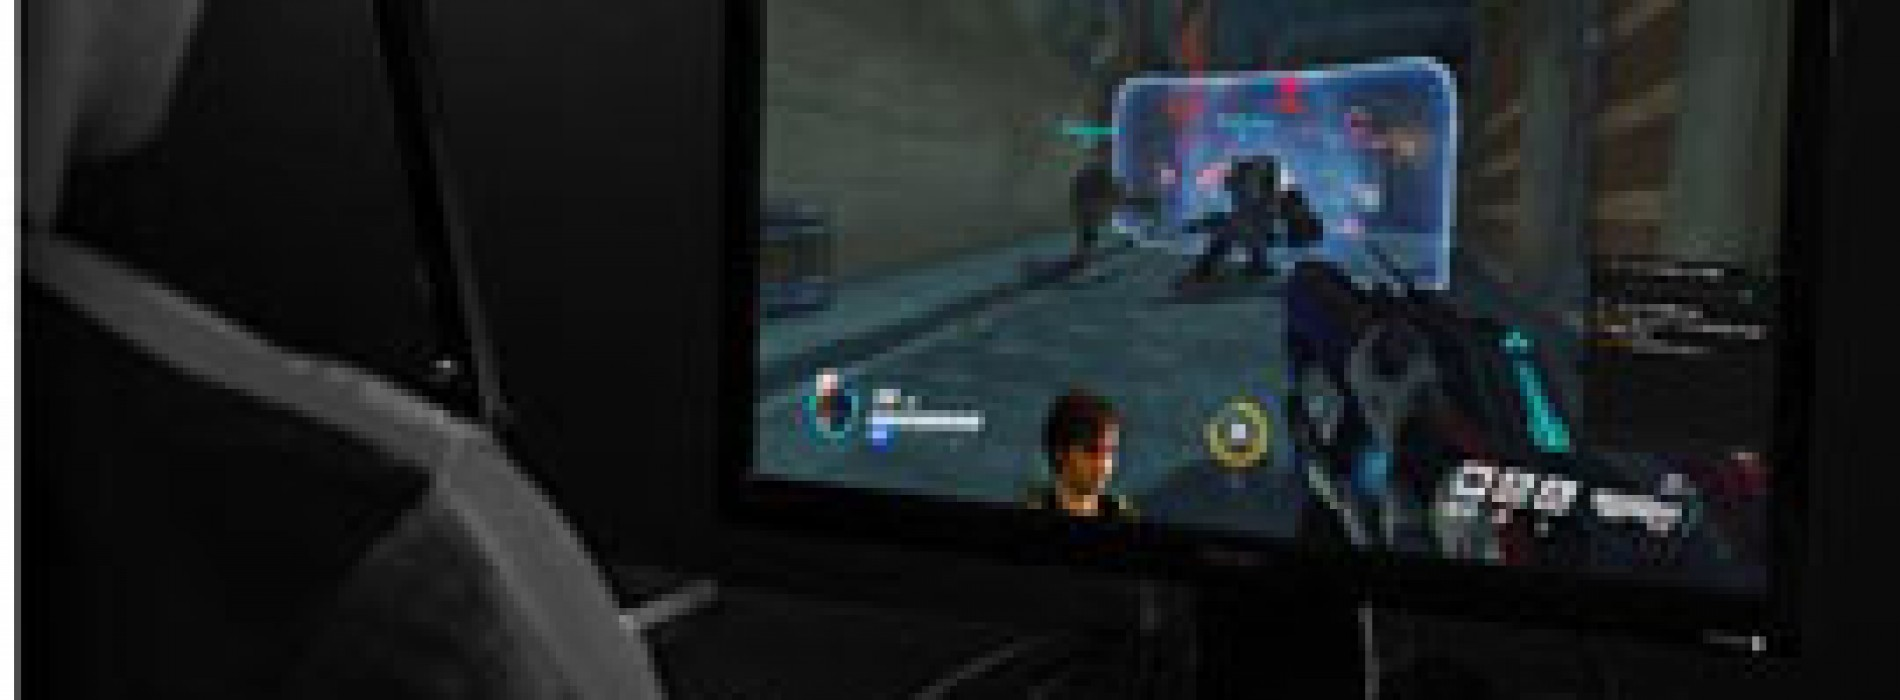 Software de transmisión en vivo para Gamers